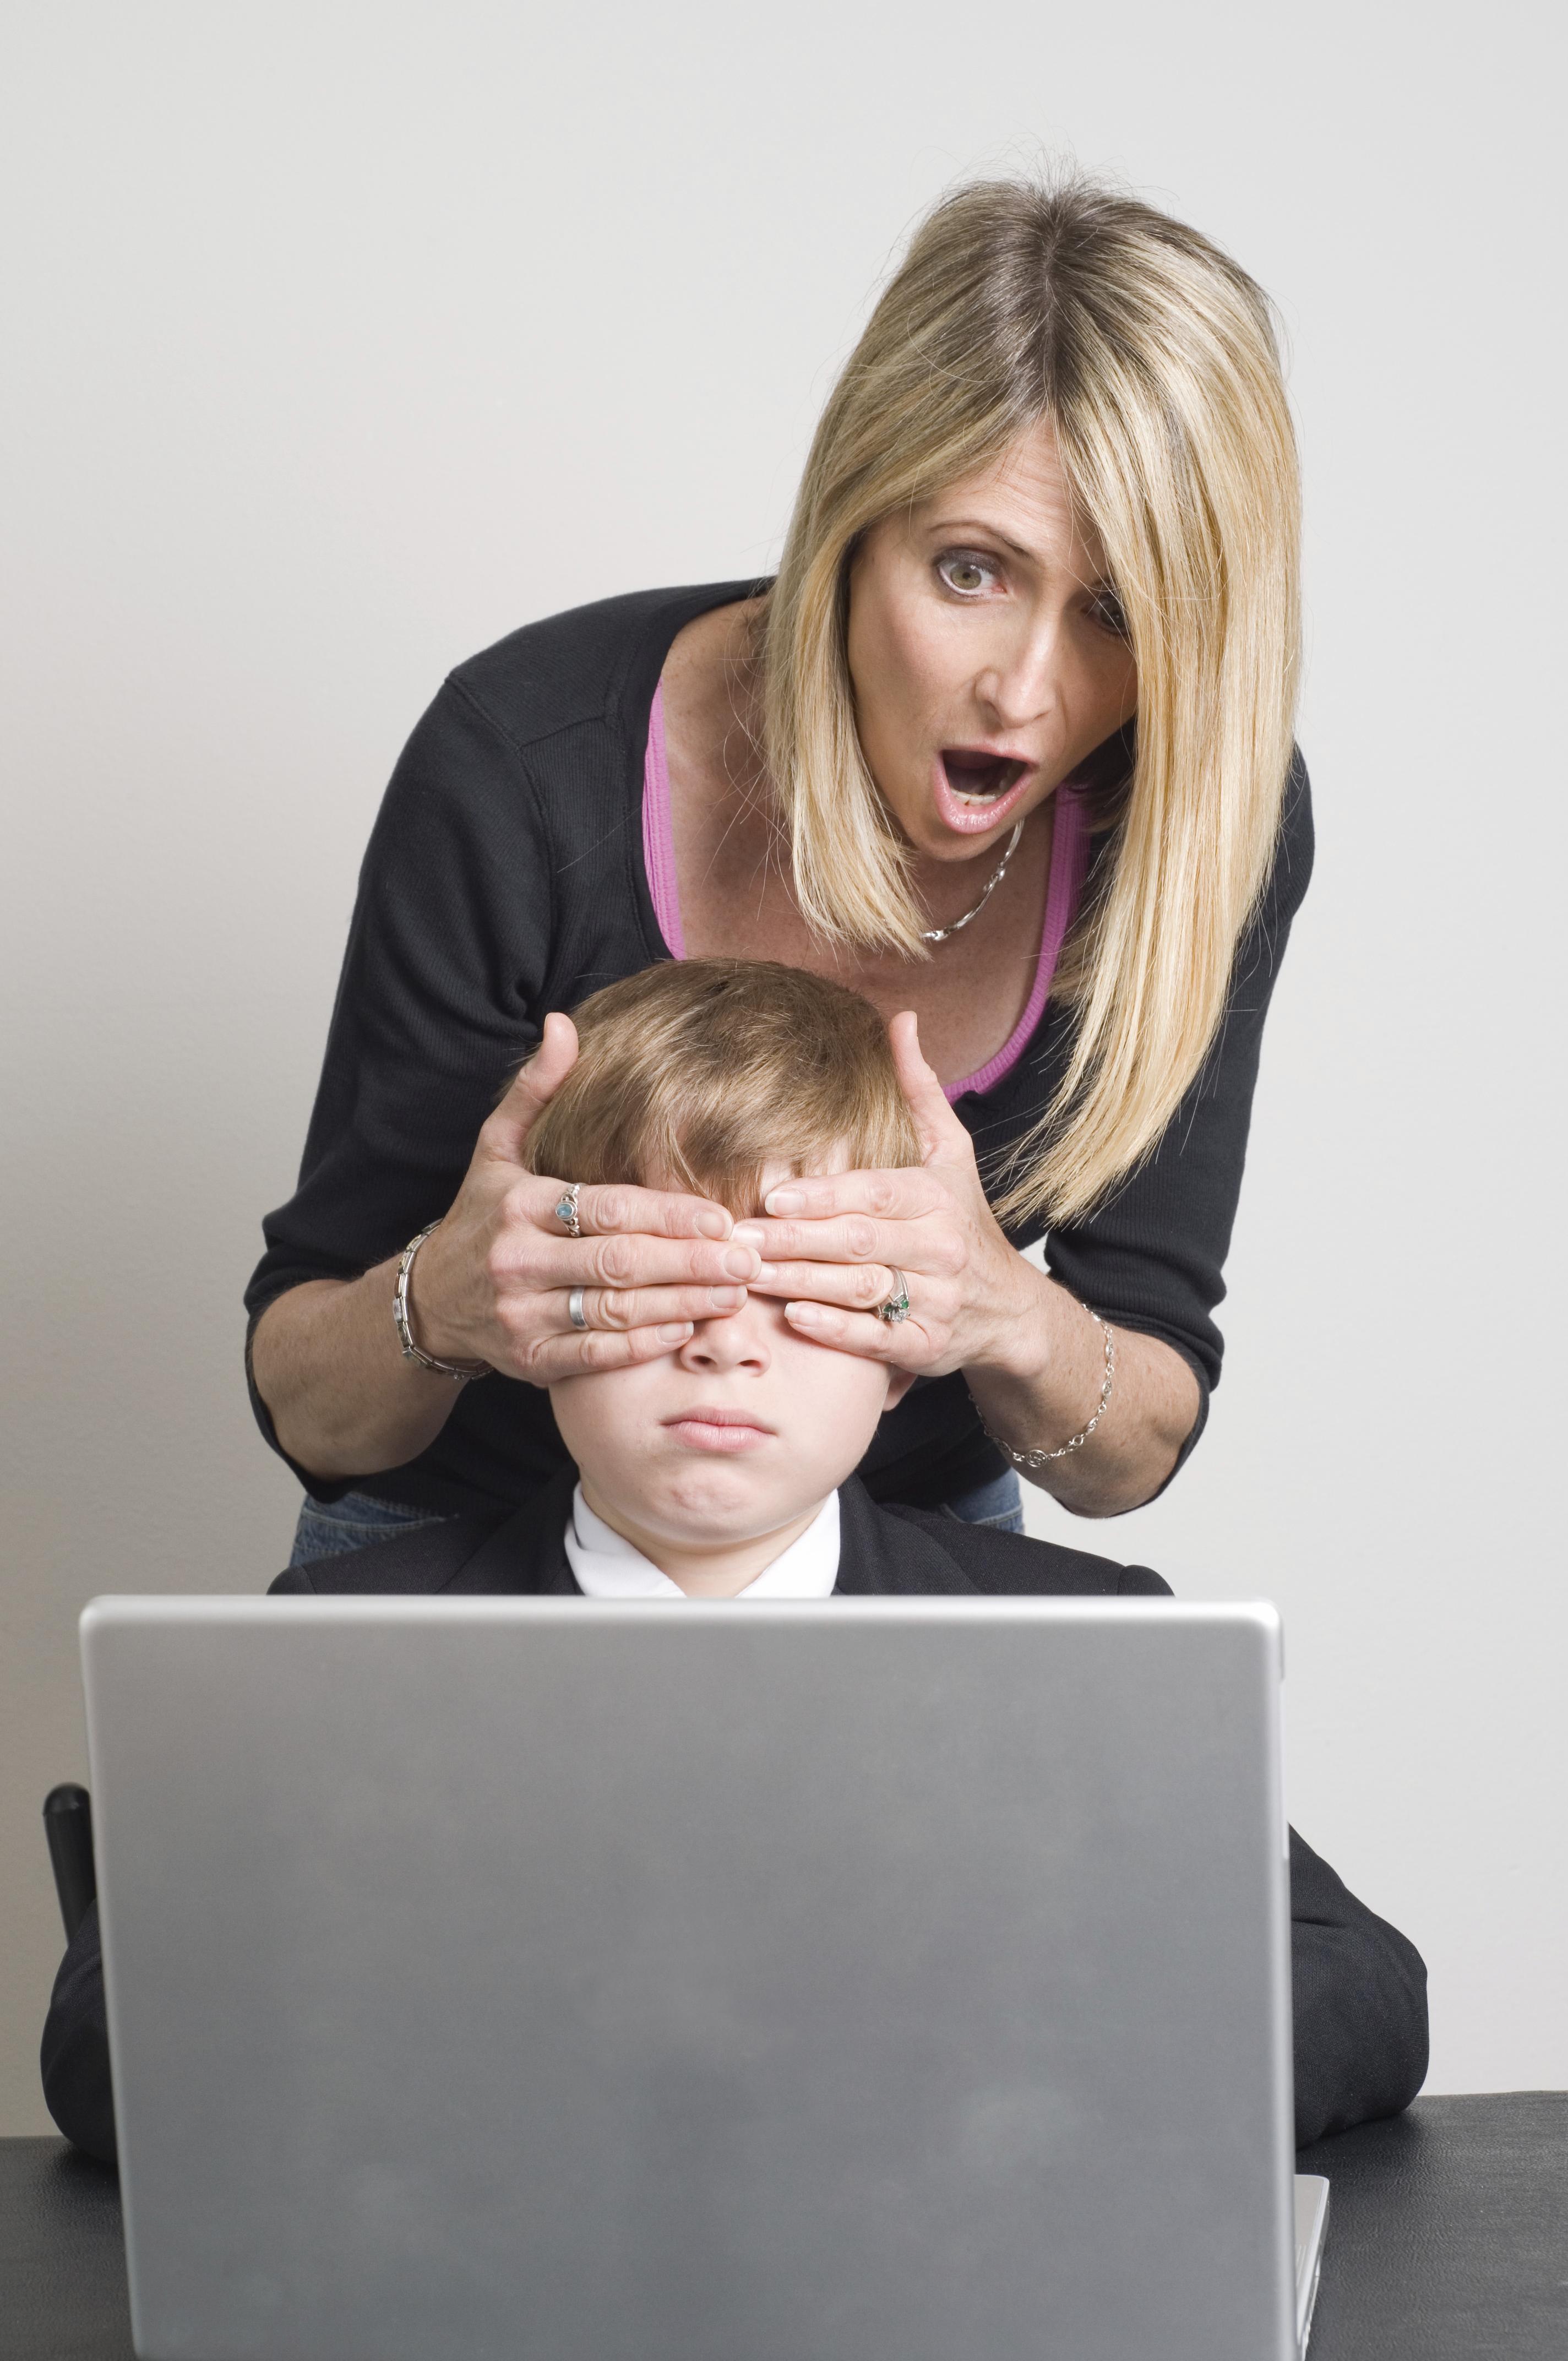 child-internet